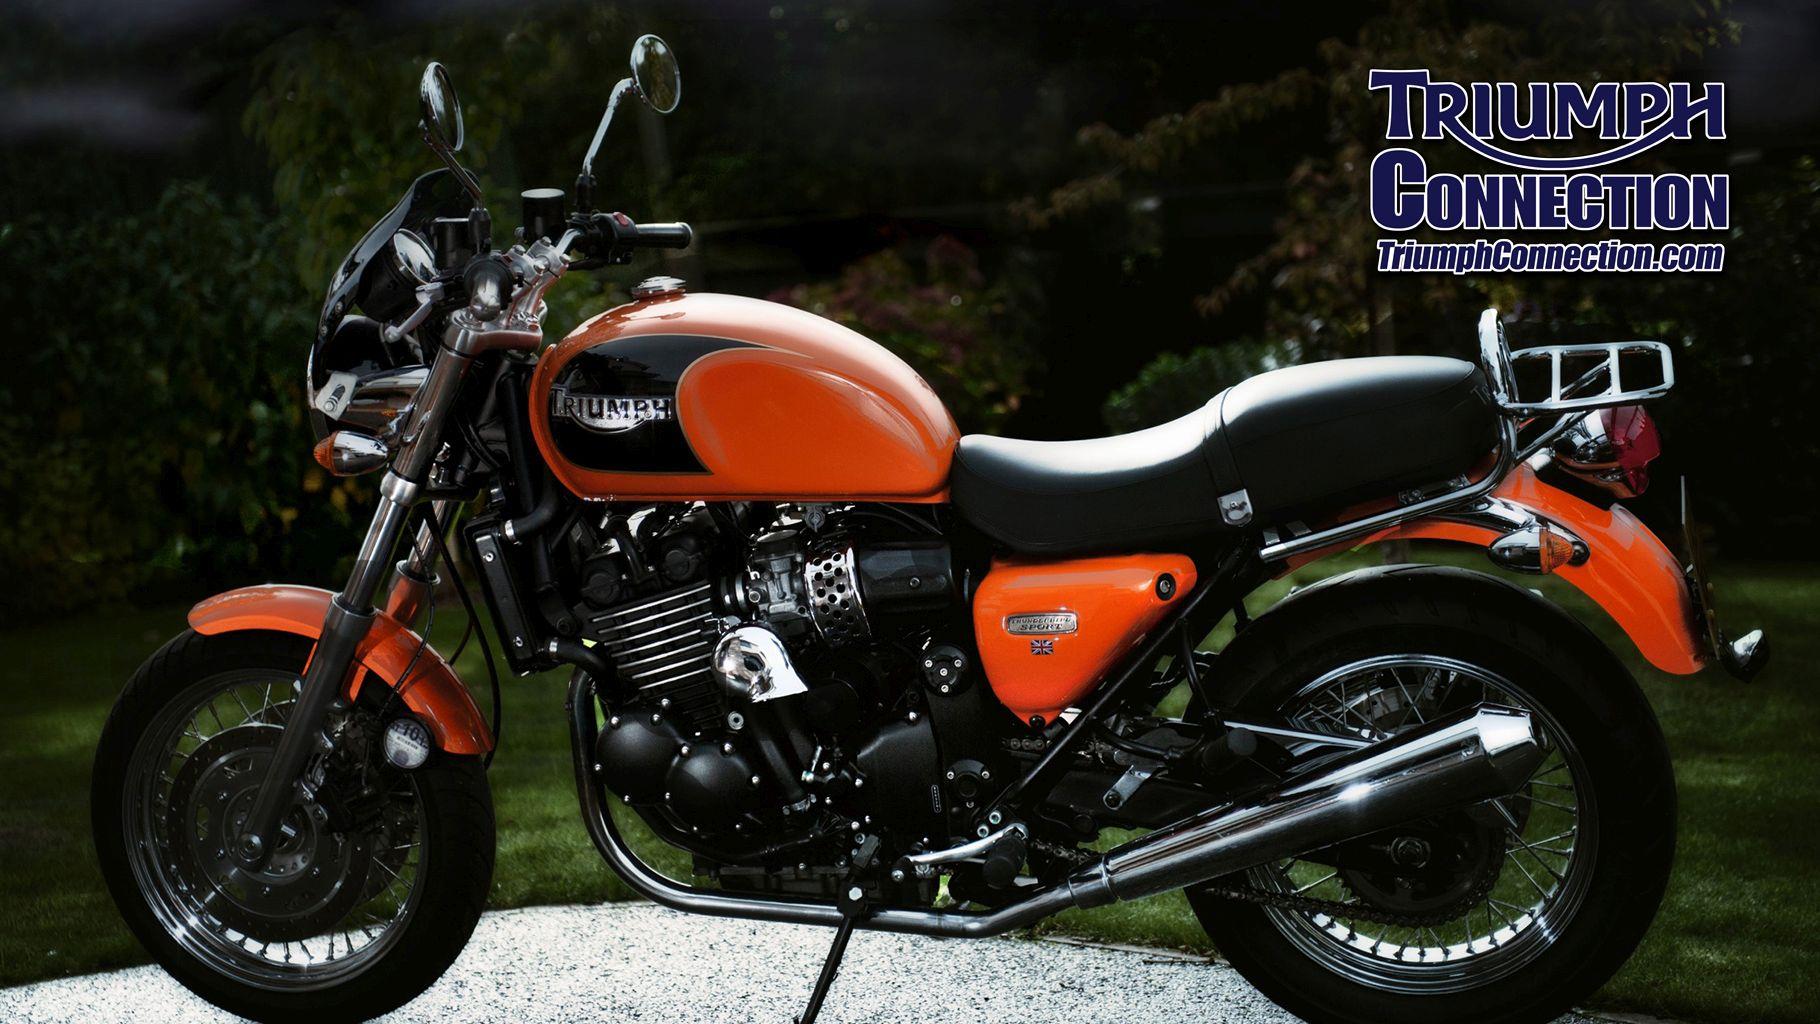 Triumph Motorcycle 650cc Primary Chain Tensioner Blade Rebuild Kit